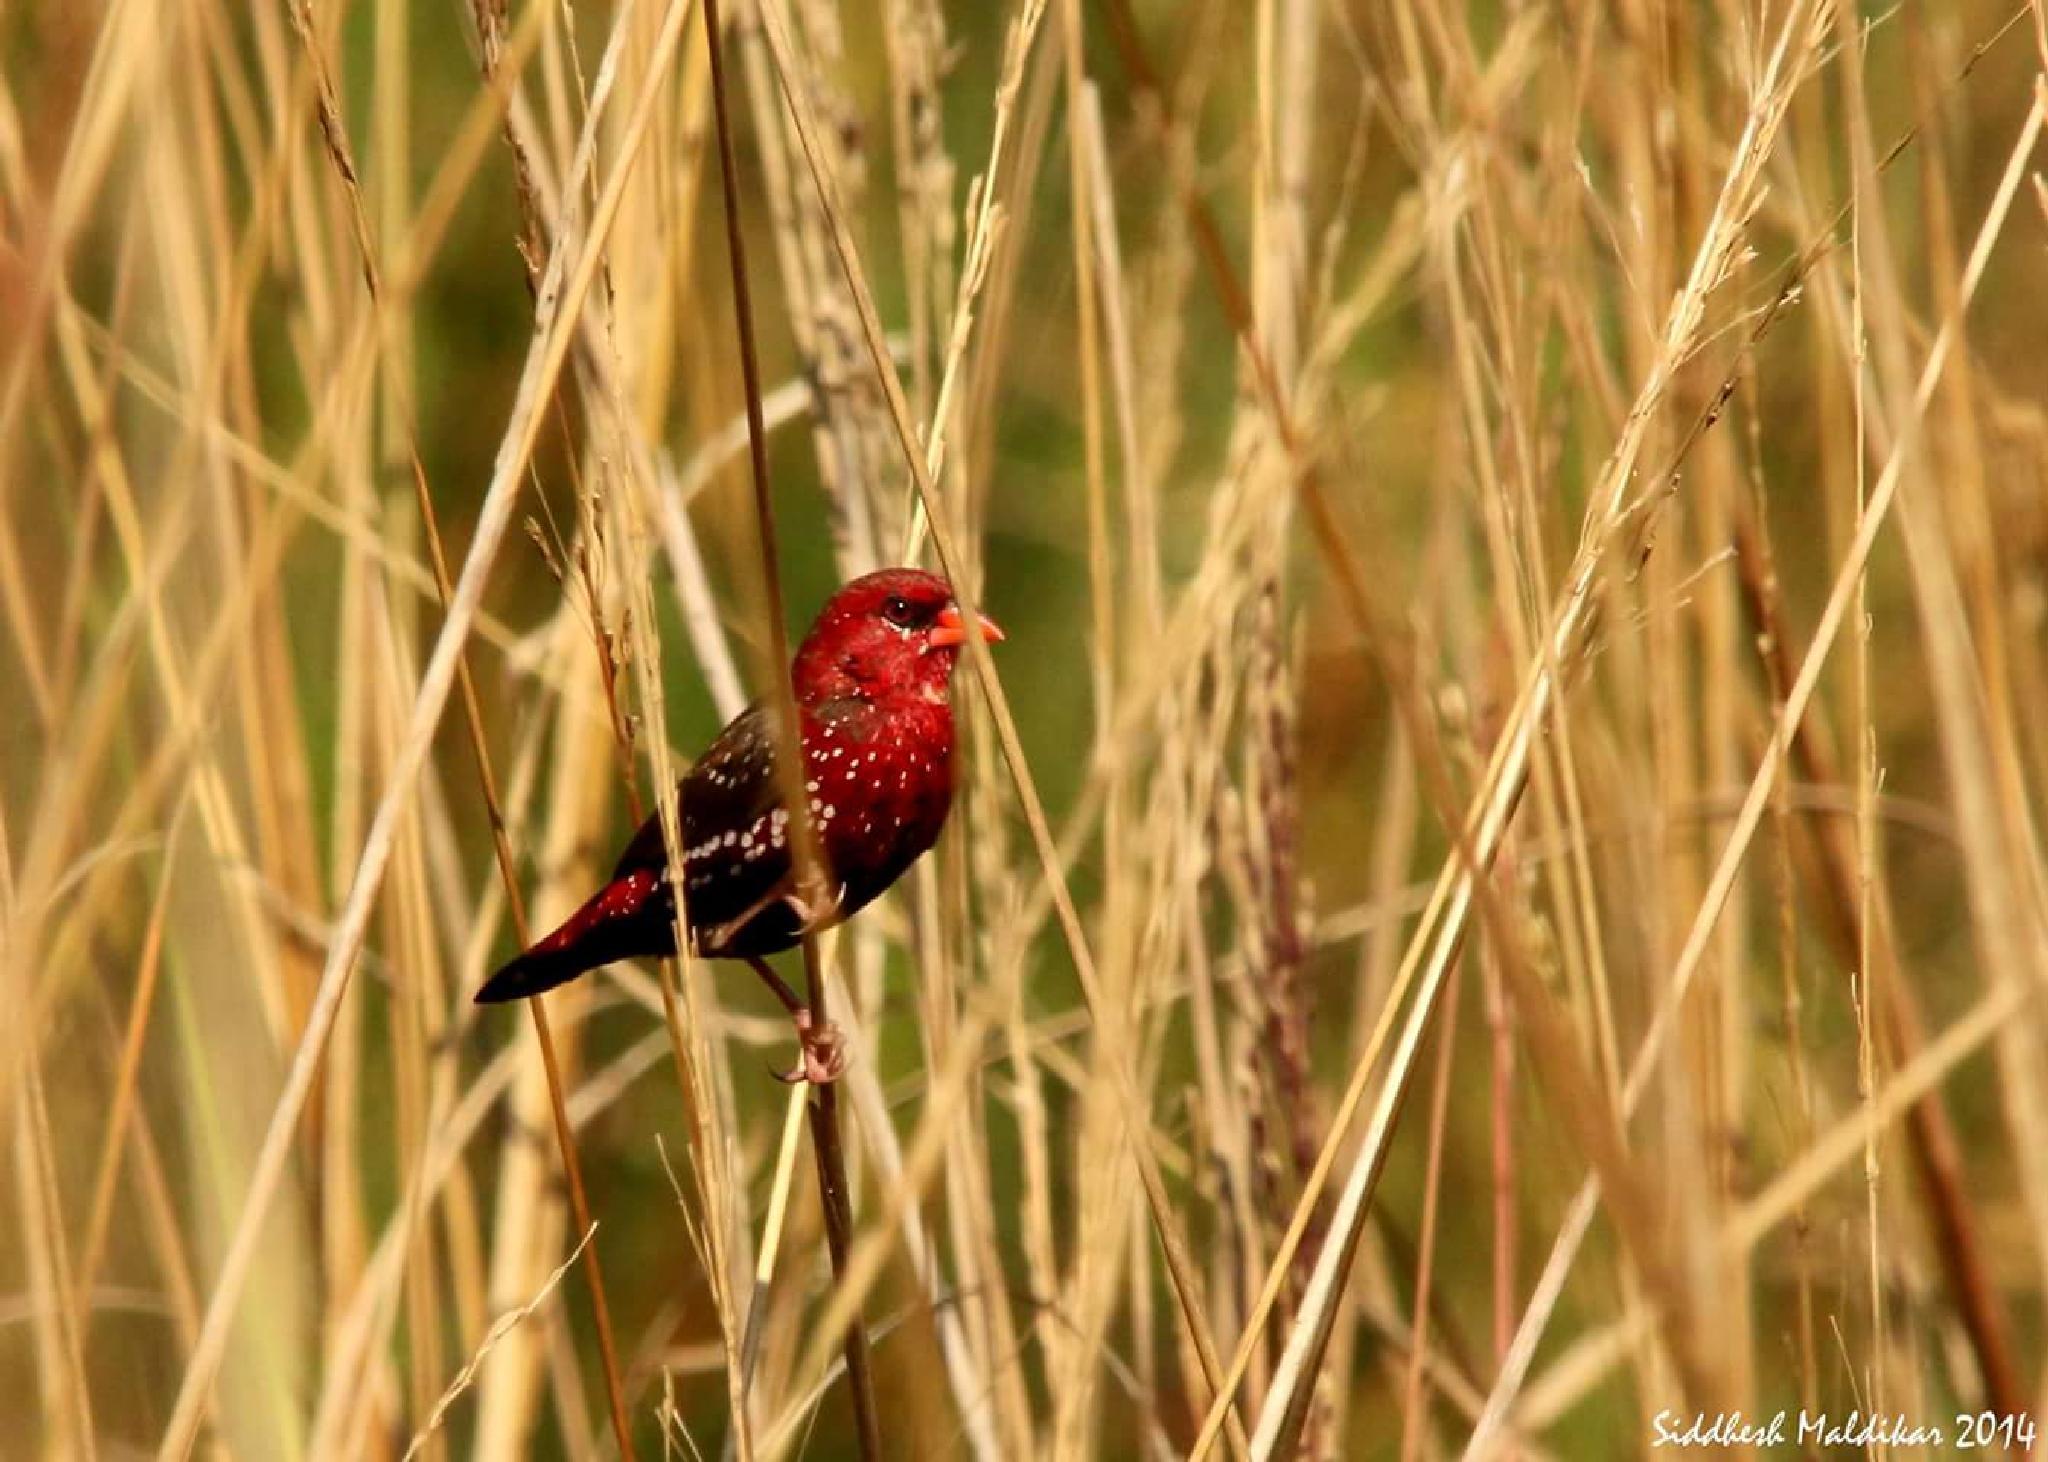 If strawberry was a bird...  by Sidsouthpaw